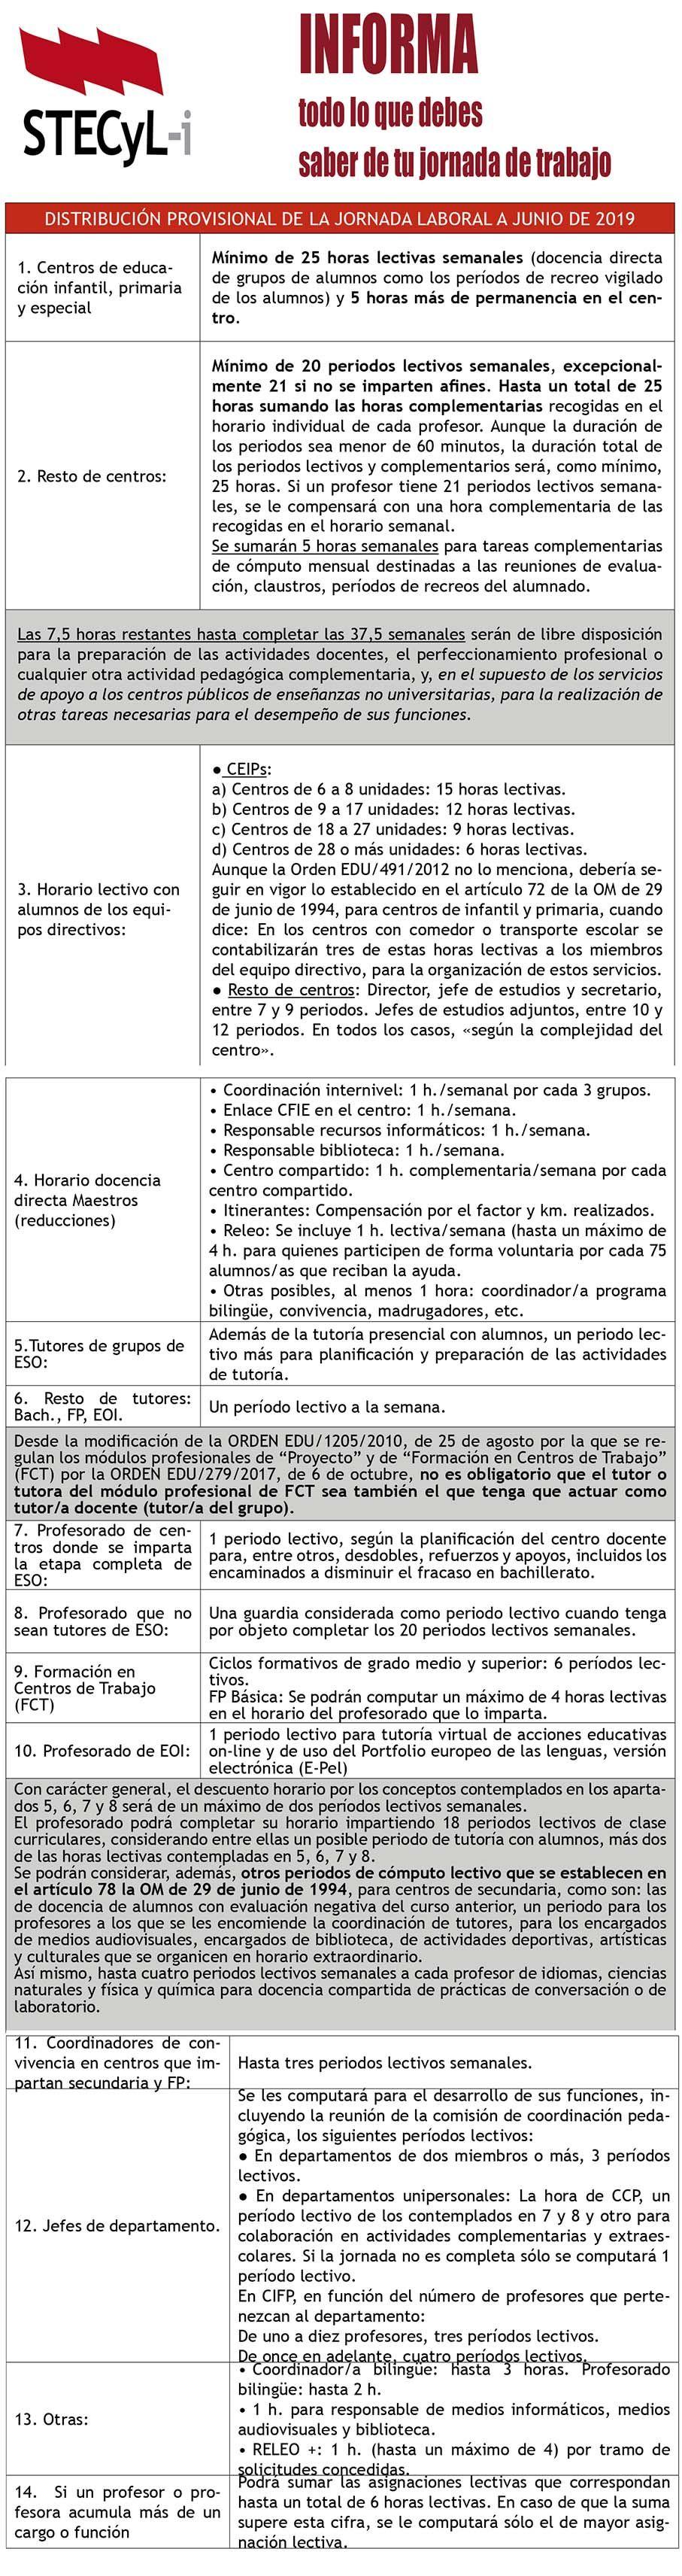 19-20-Distribucion-Jornada-Laboral-Docente